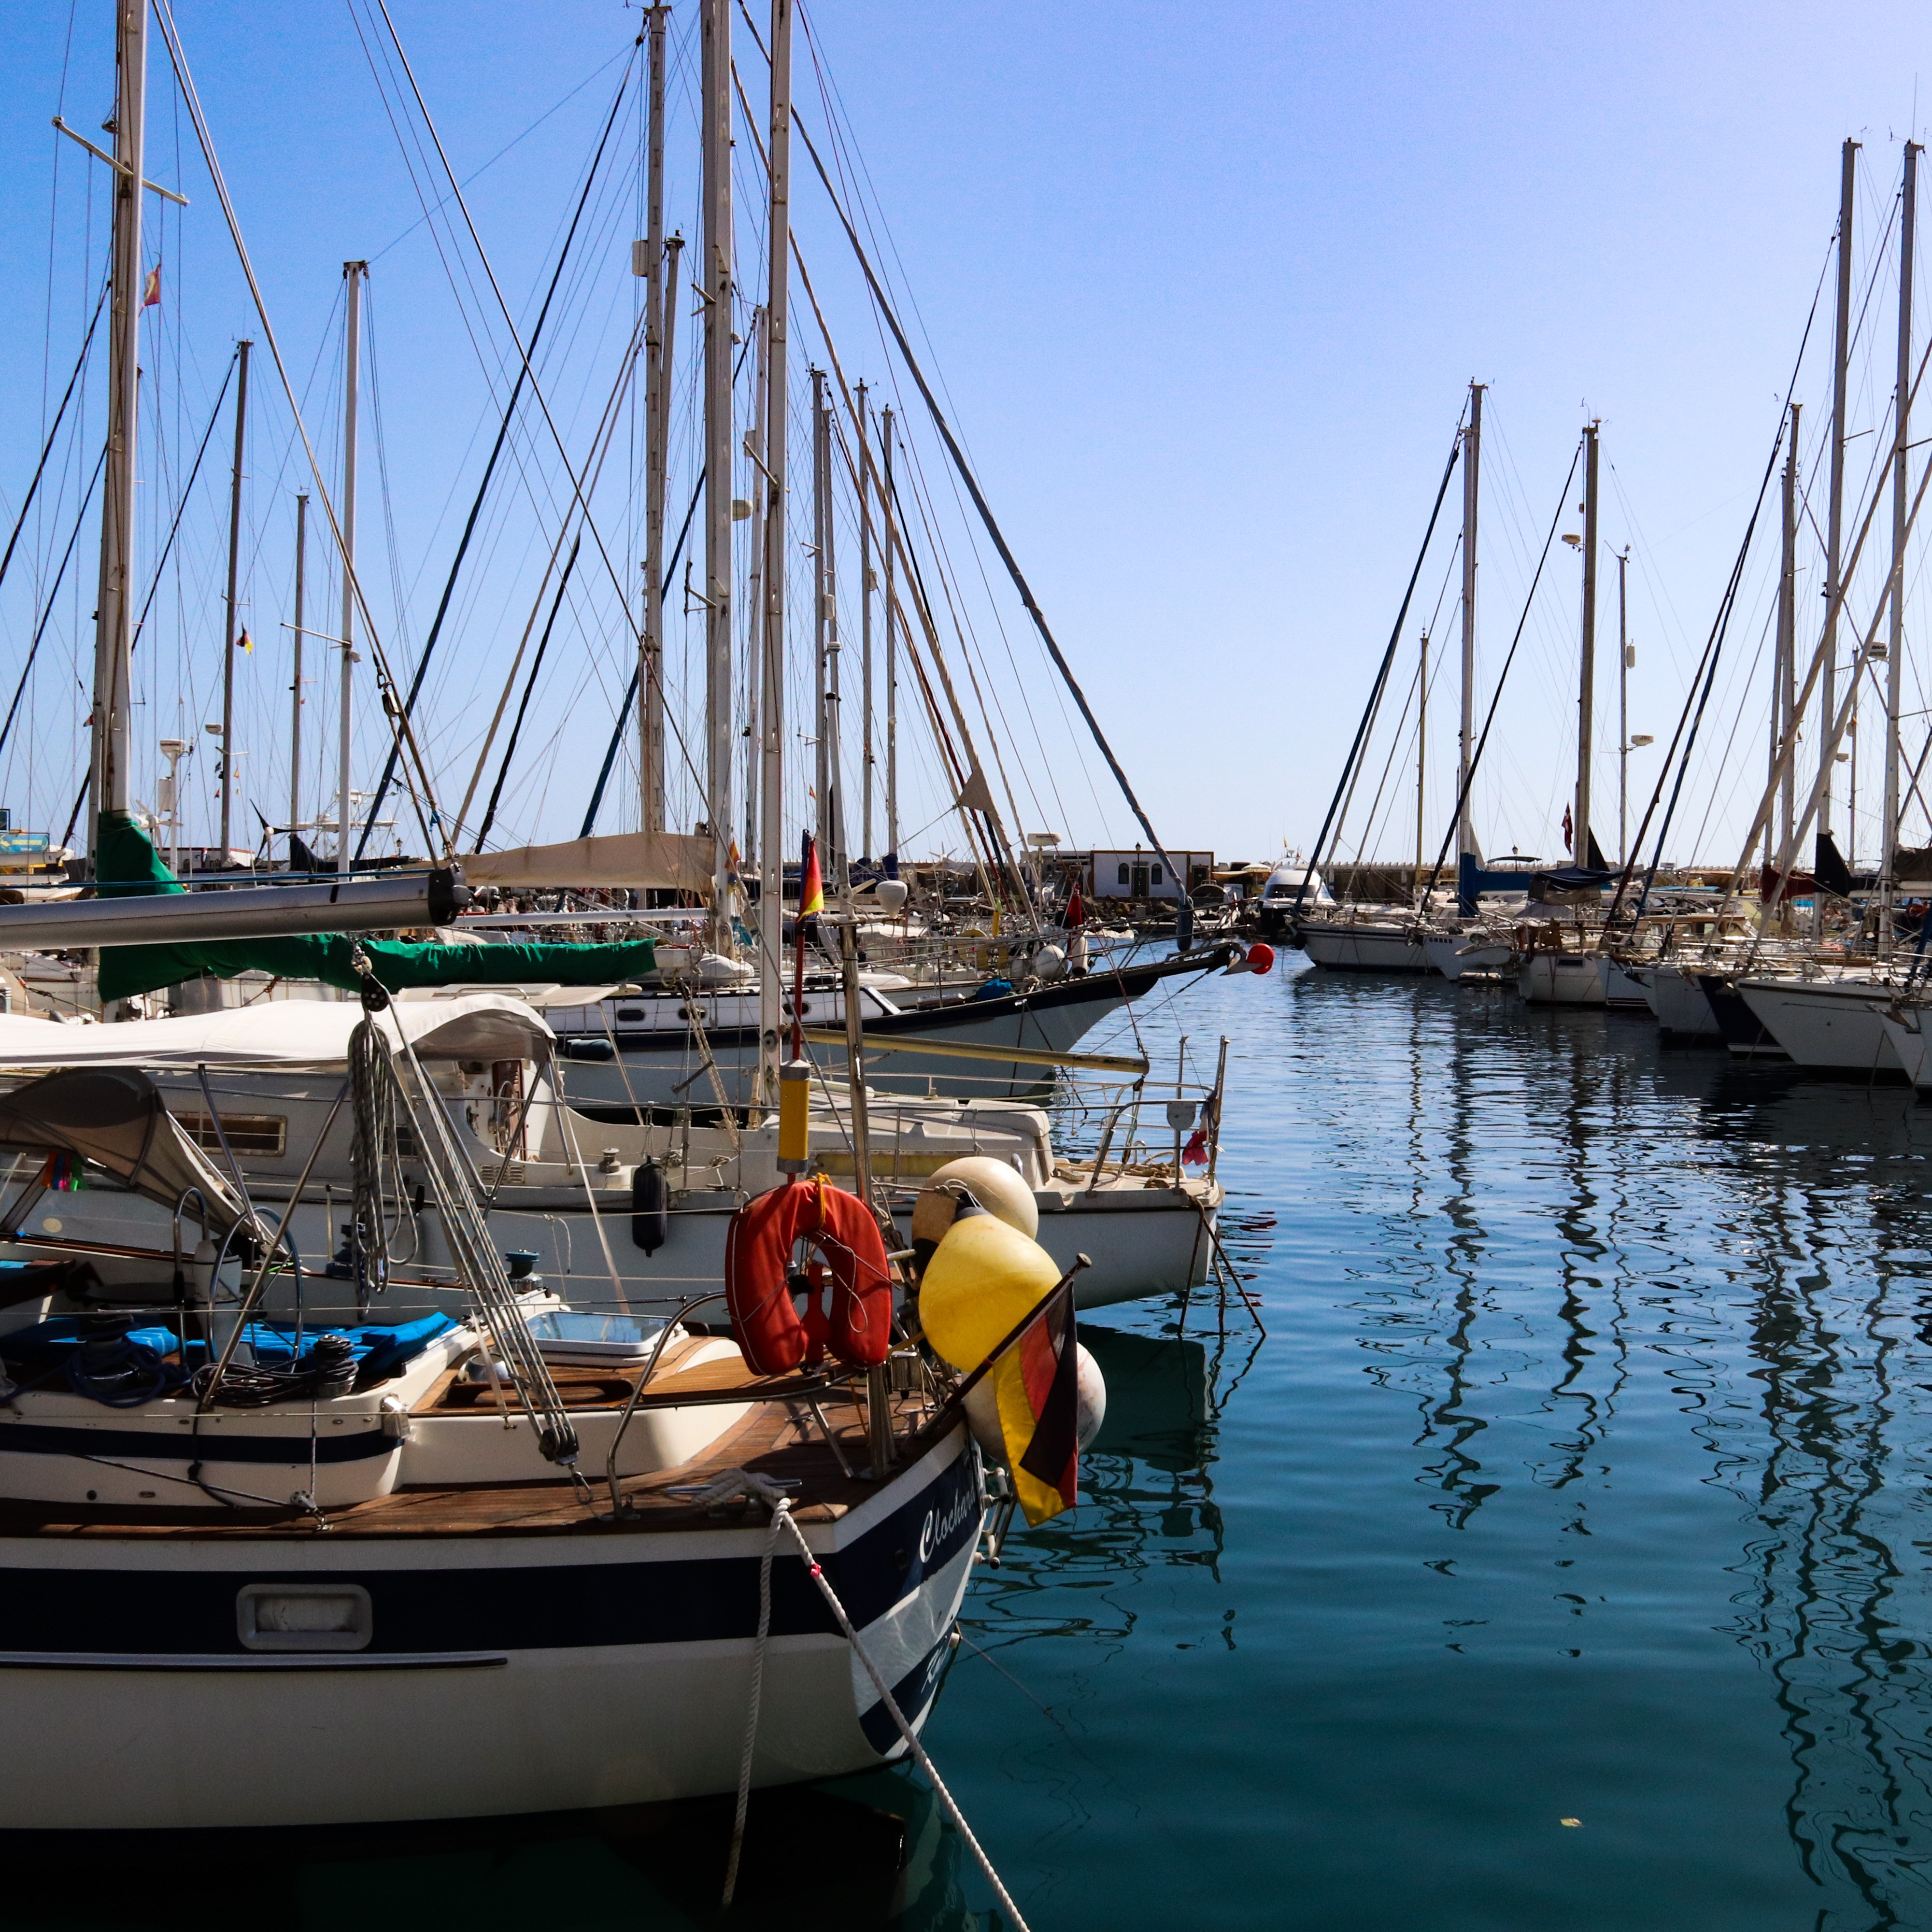 Yachts inside the Marino of Peurto de Mogan, Gran Canaria.